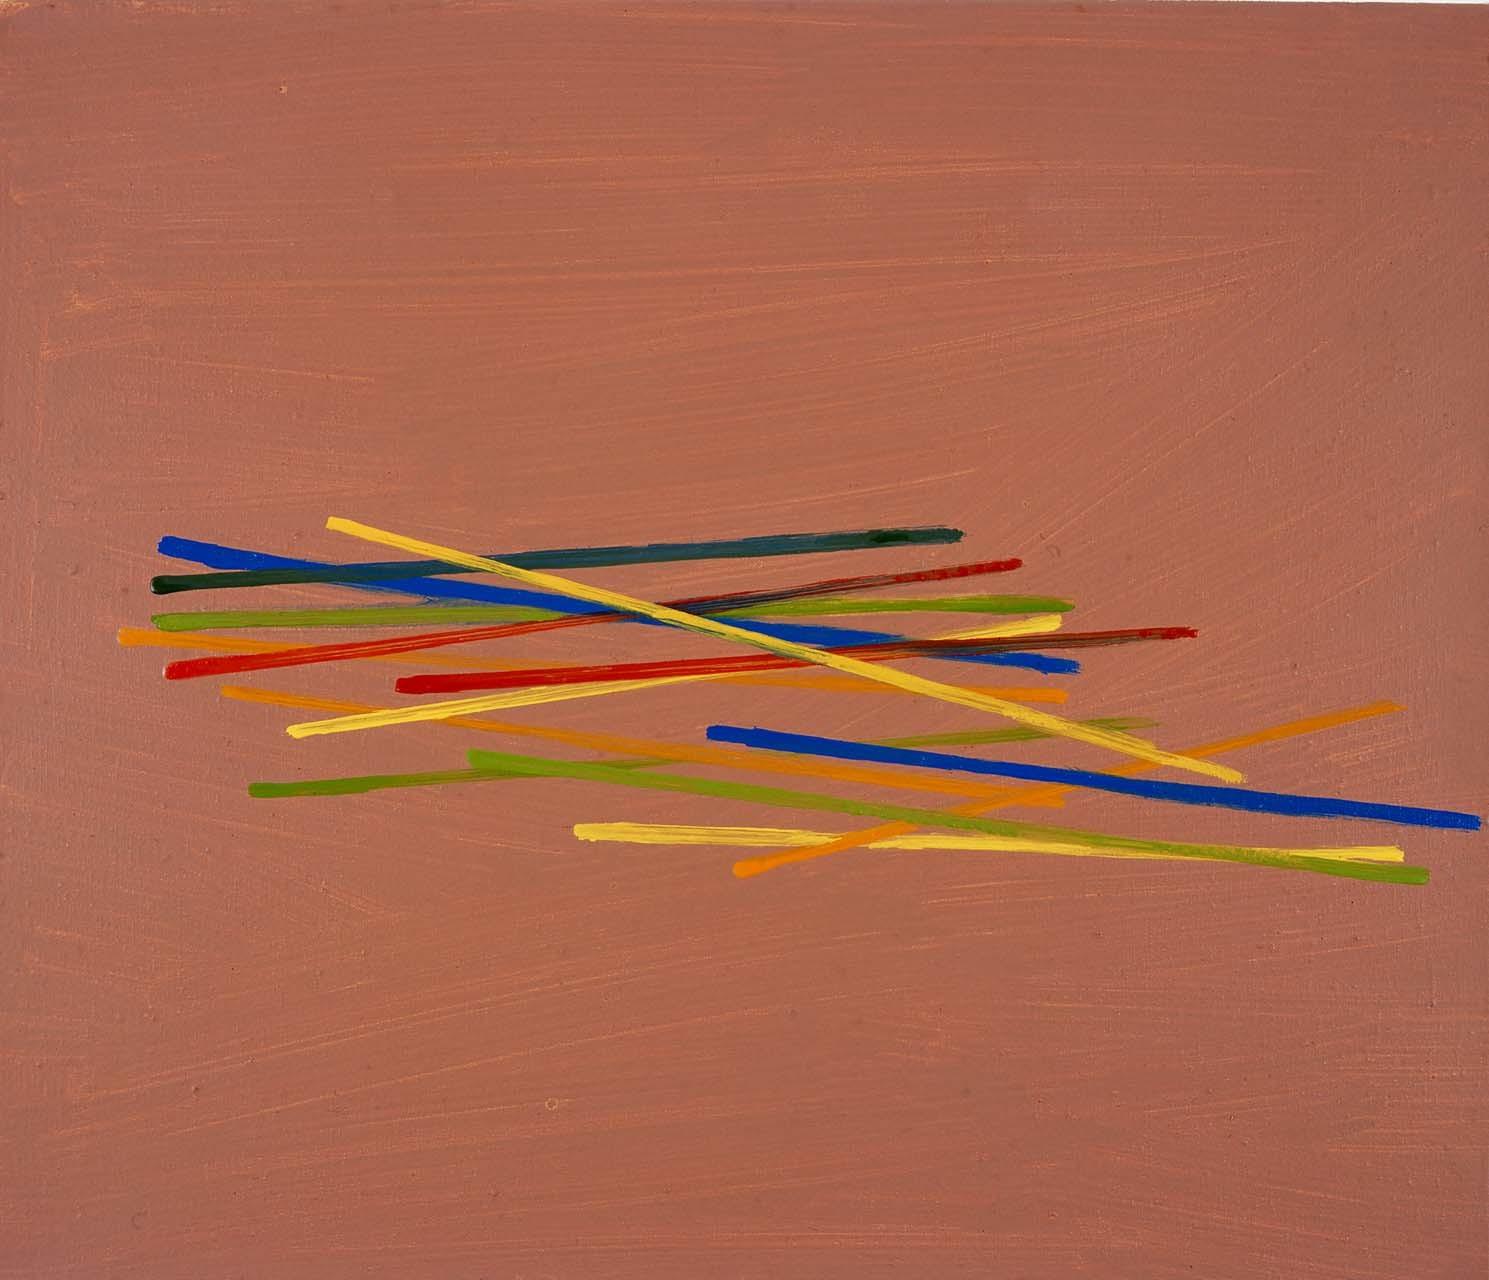 <p>Untitled (pick-up sticks), 2003</p>